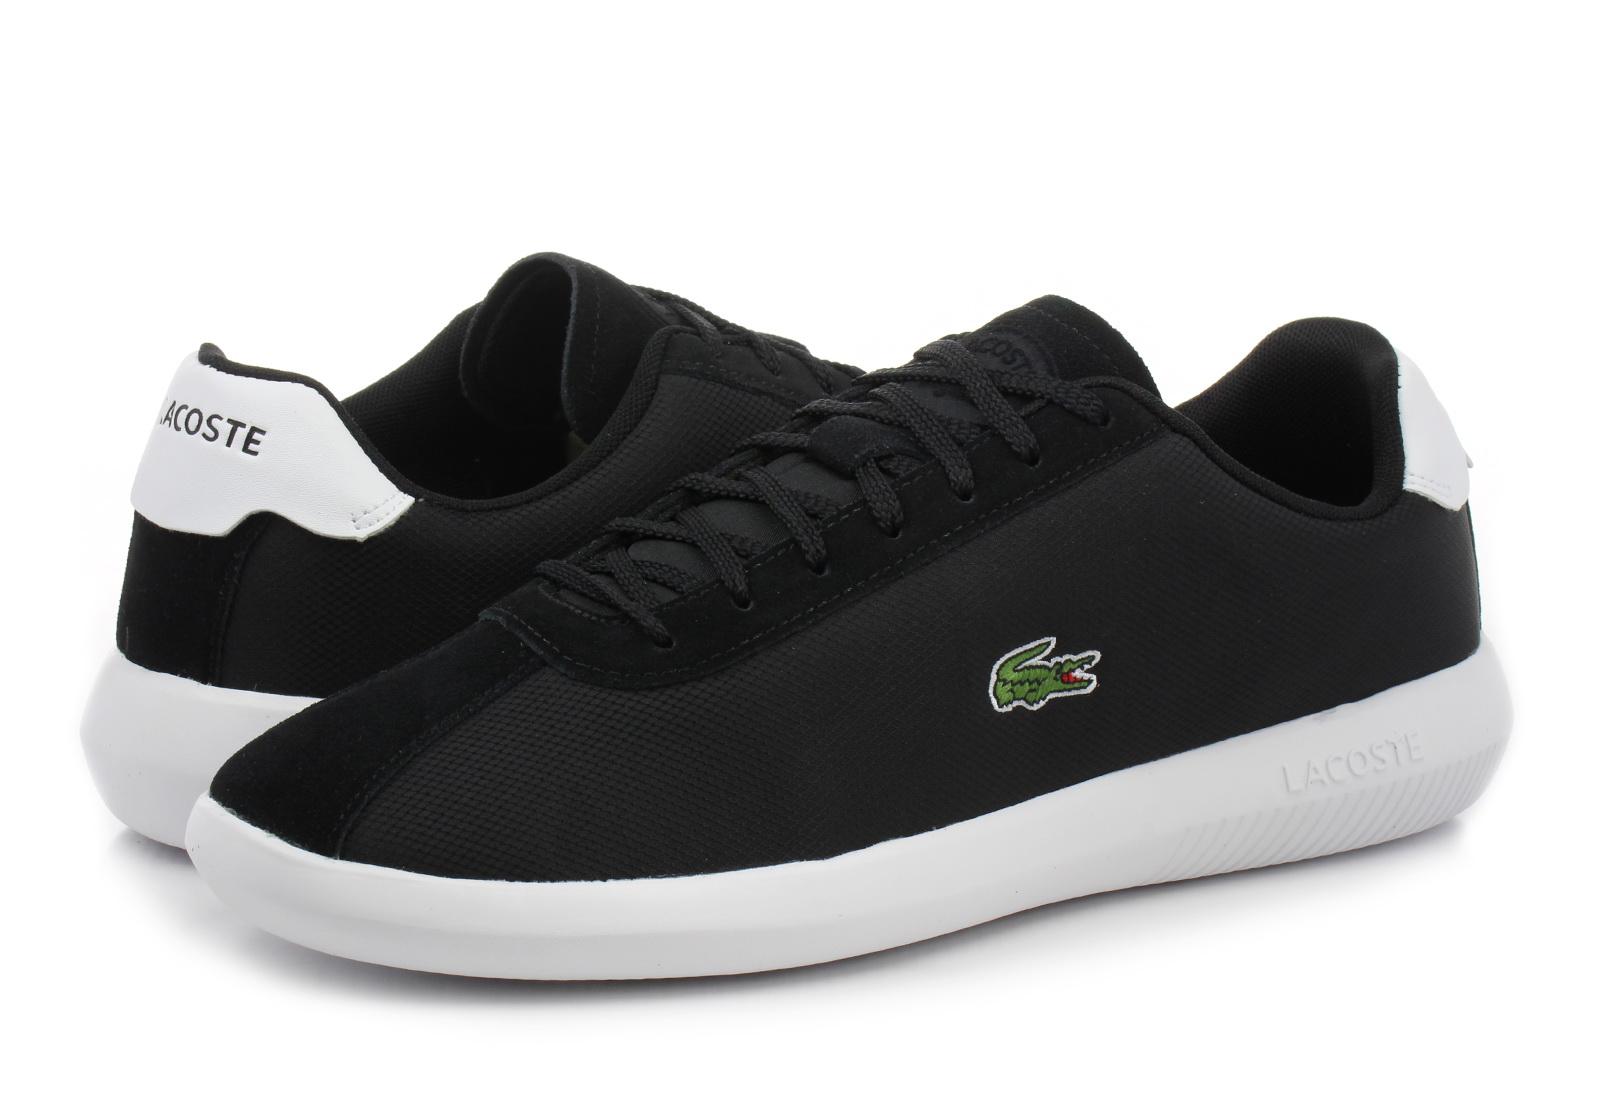 Boots Shoes For Avance Lacoste 191sma0006 312 SneakersAnd Online Shop PNnZkX80wO